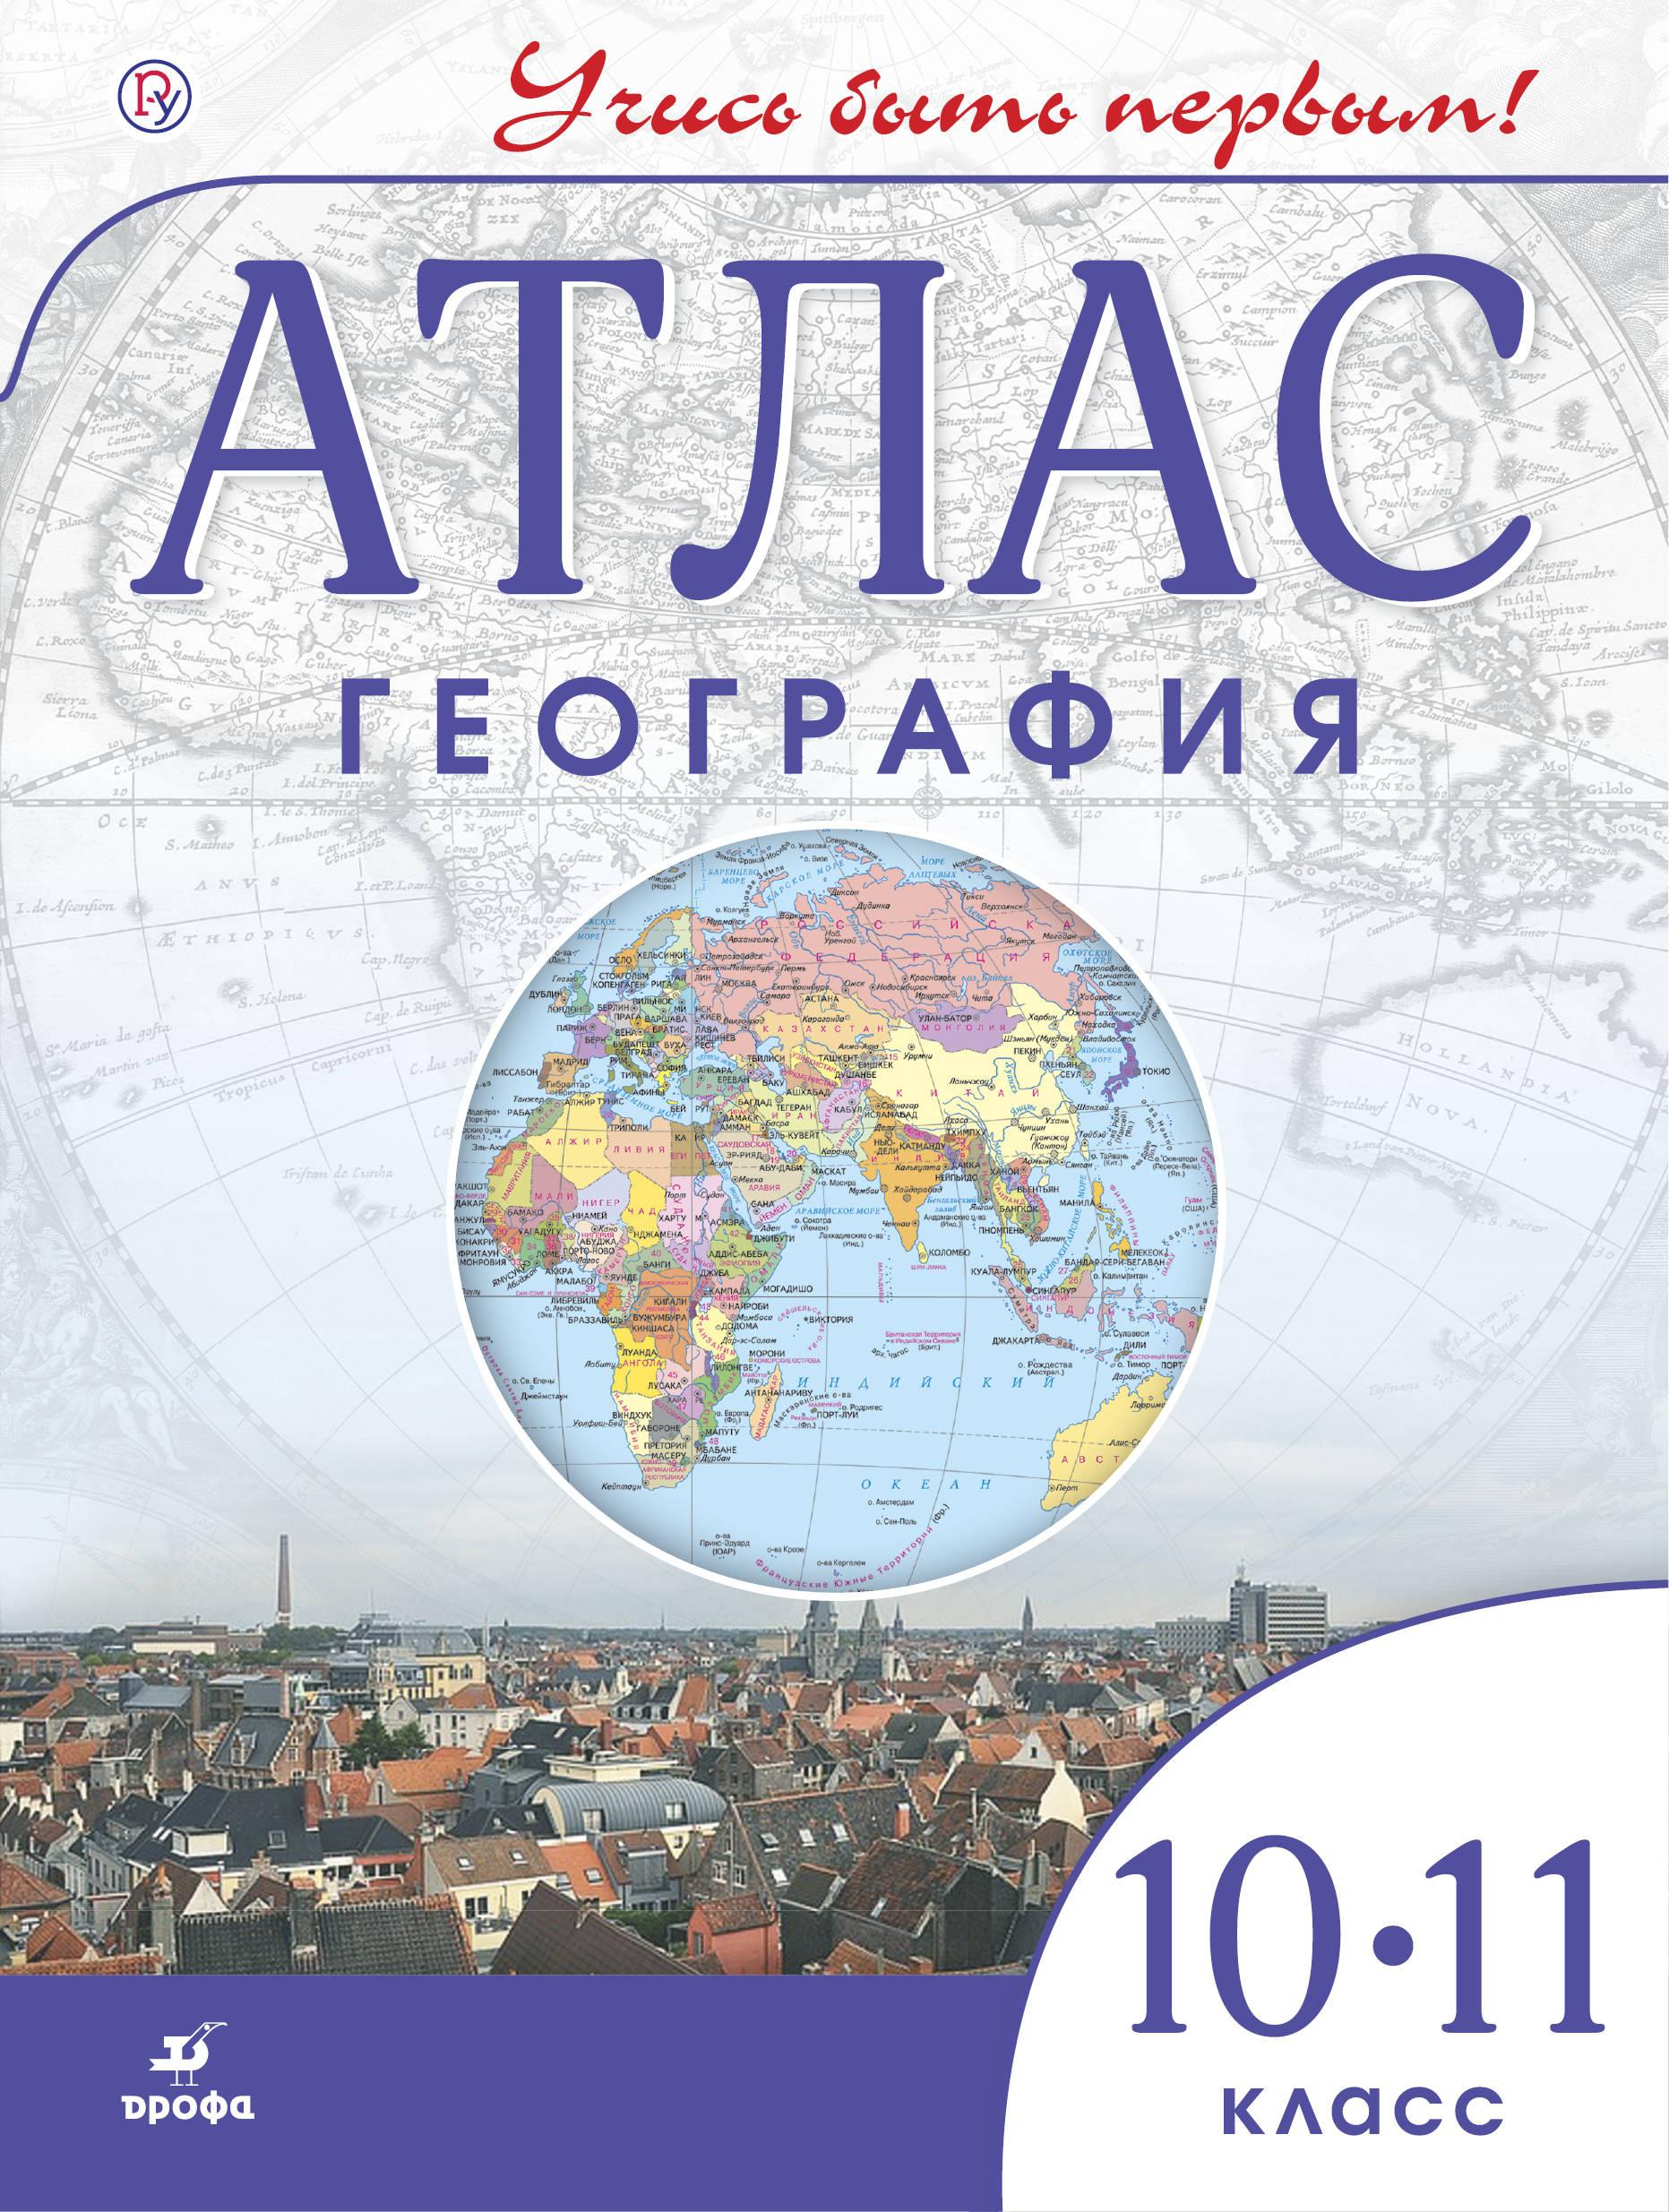 Гущина Т. А. География. 10-11 классы. Атлас